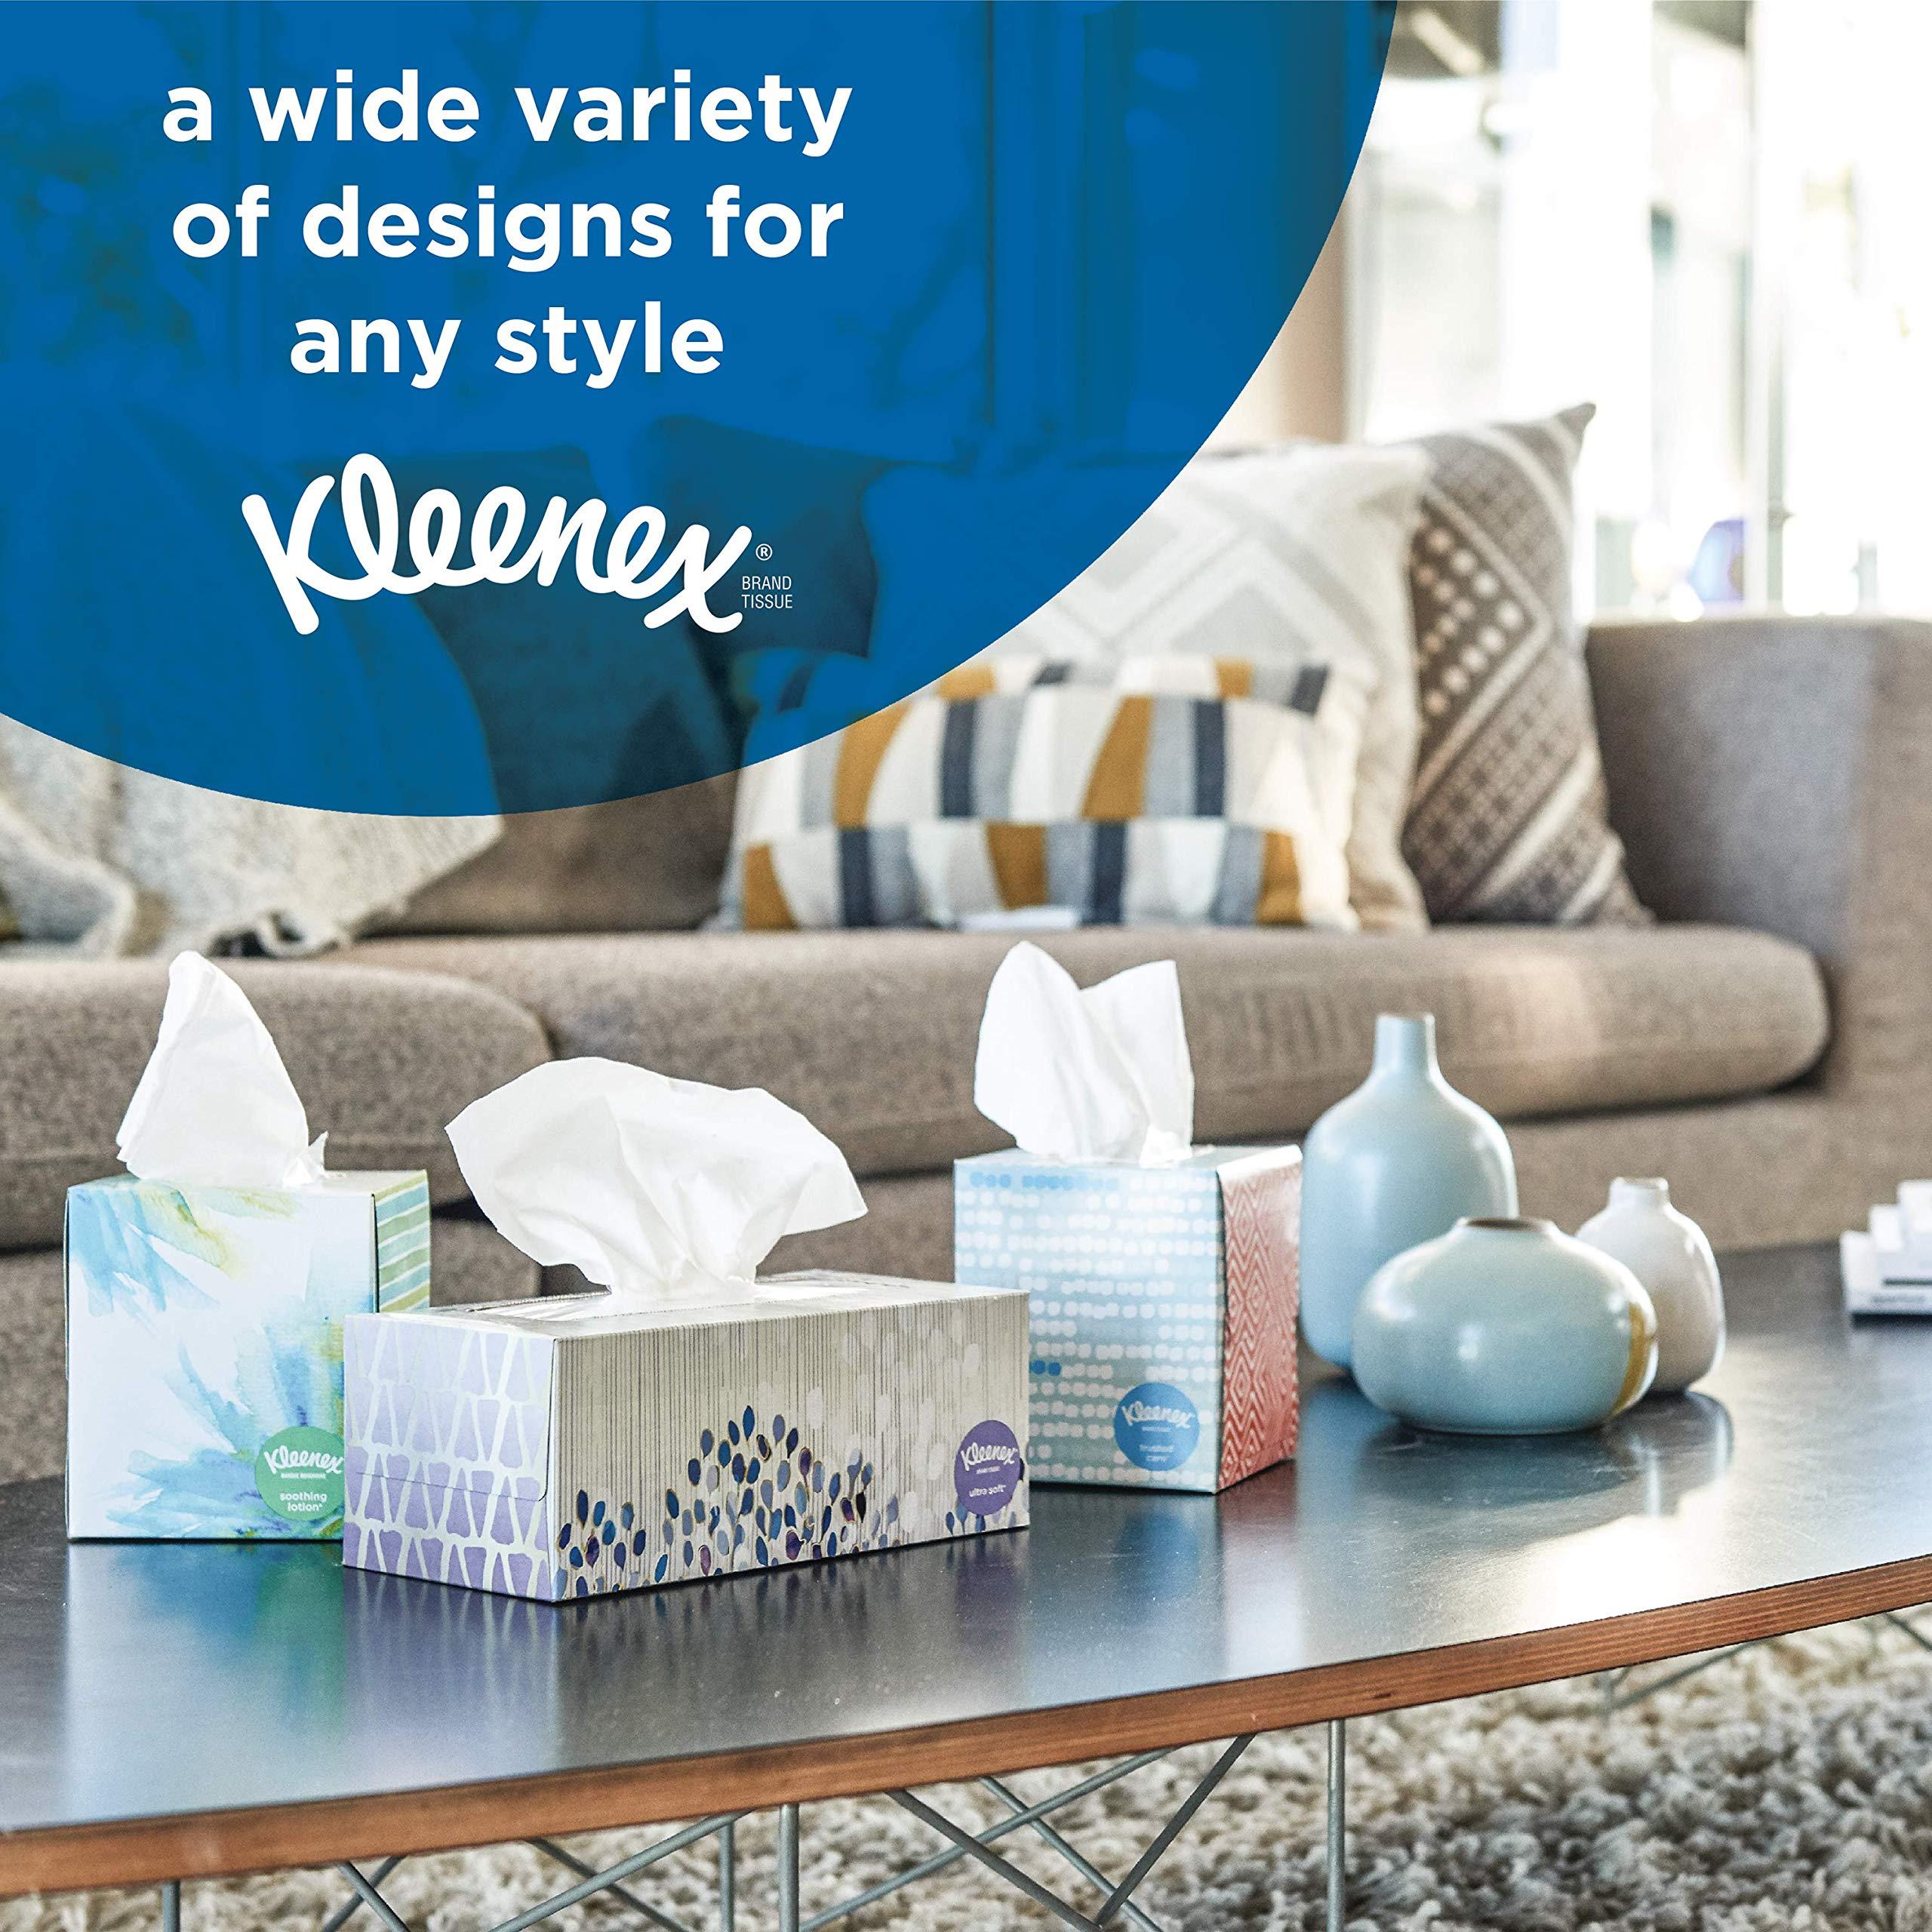 Kleenex Lotion Facial Tissues with Aloe & Vitamin E, Cube Box, 75 Tissues per Cube Box, 18 Packs by Kleenex (Image #6)